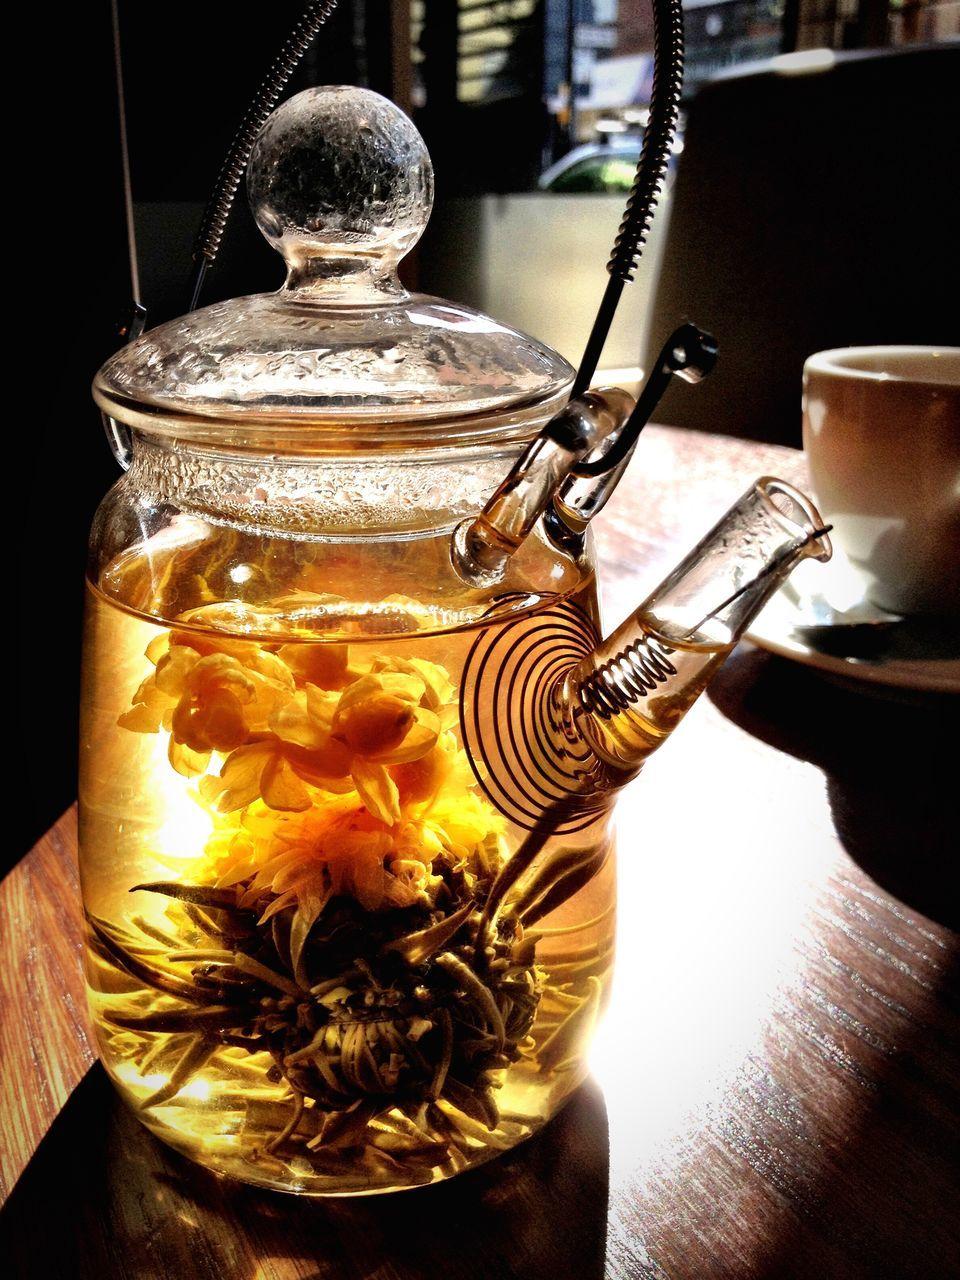 Close-Up Of Jasmine Teapot On Table